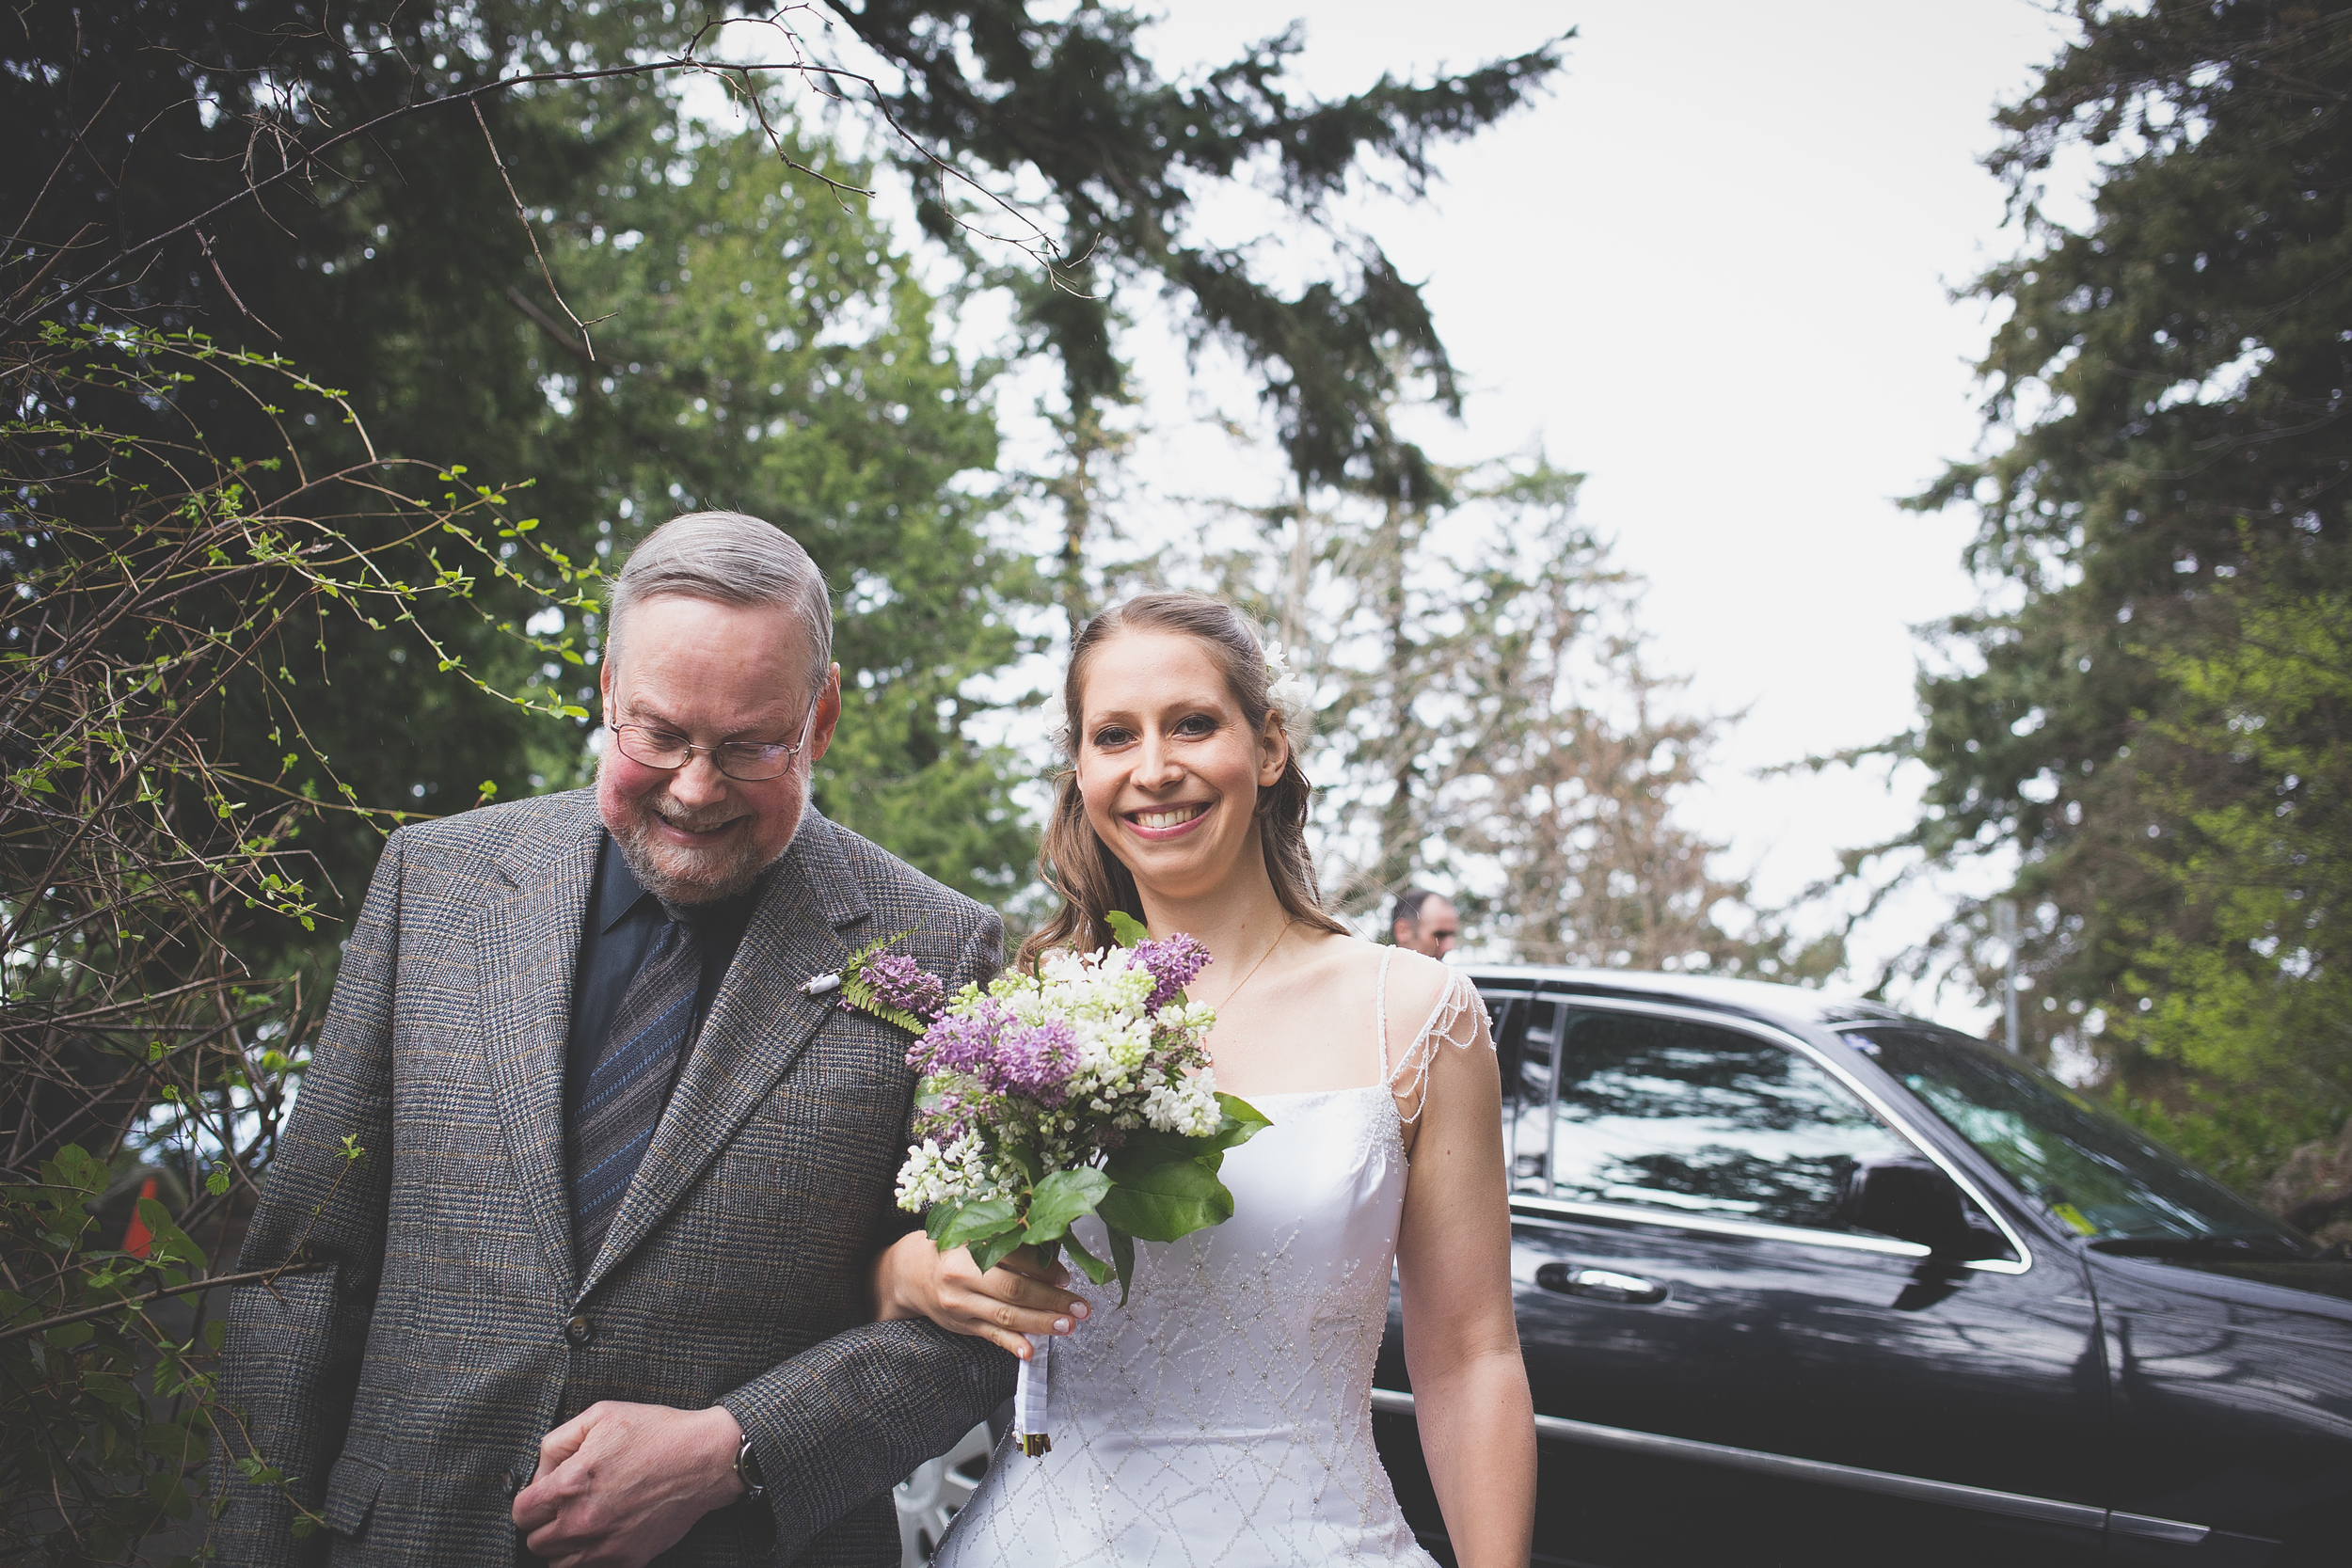 vancouver_photographer_wedding_DogwoodPhotography-67.jpg